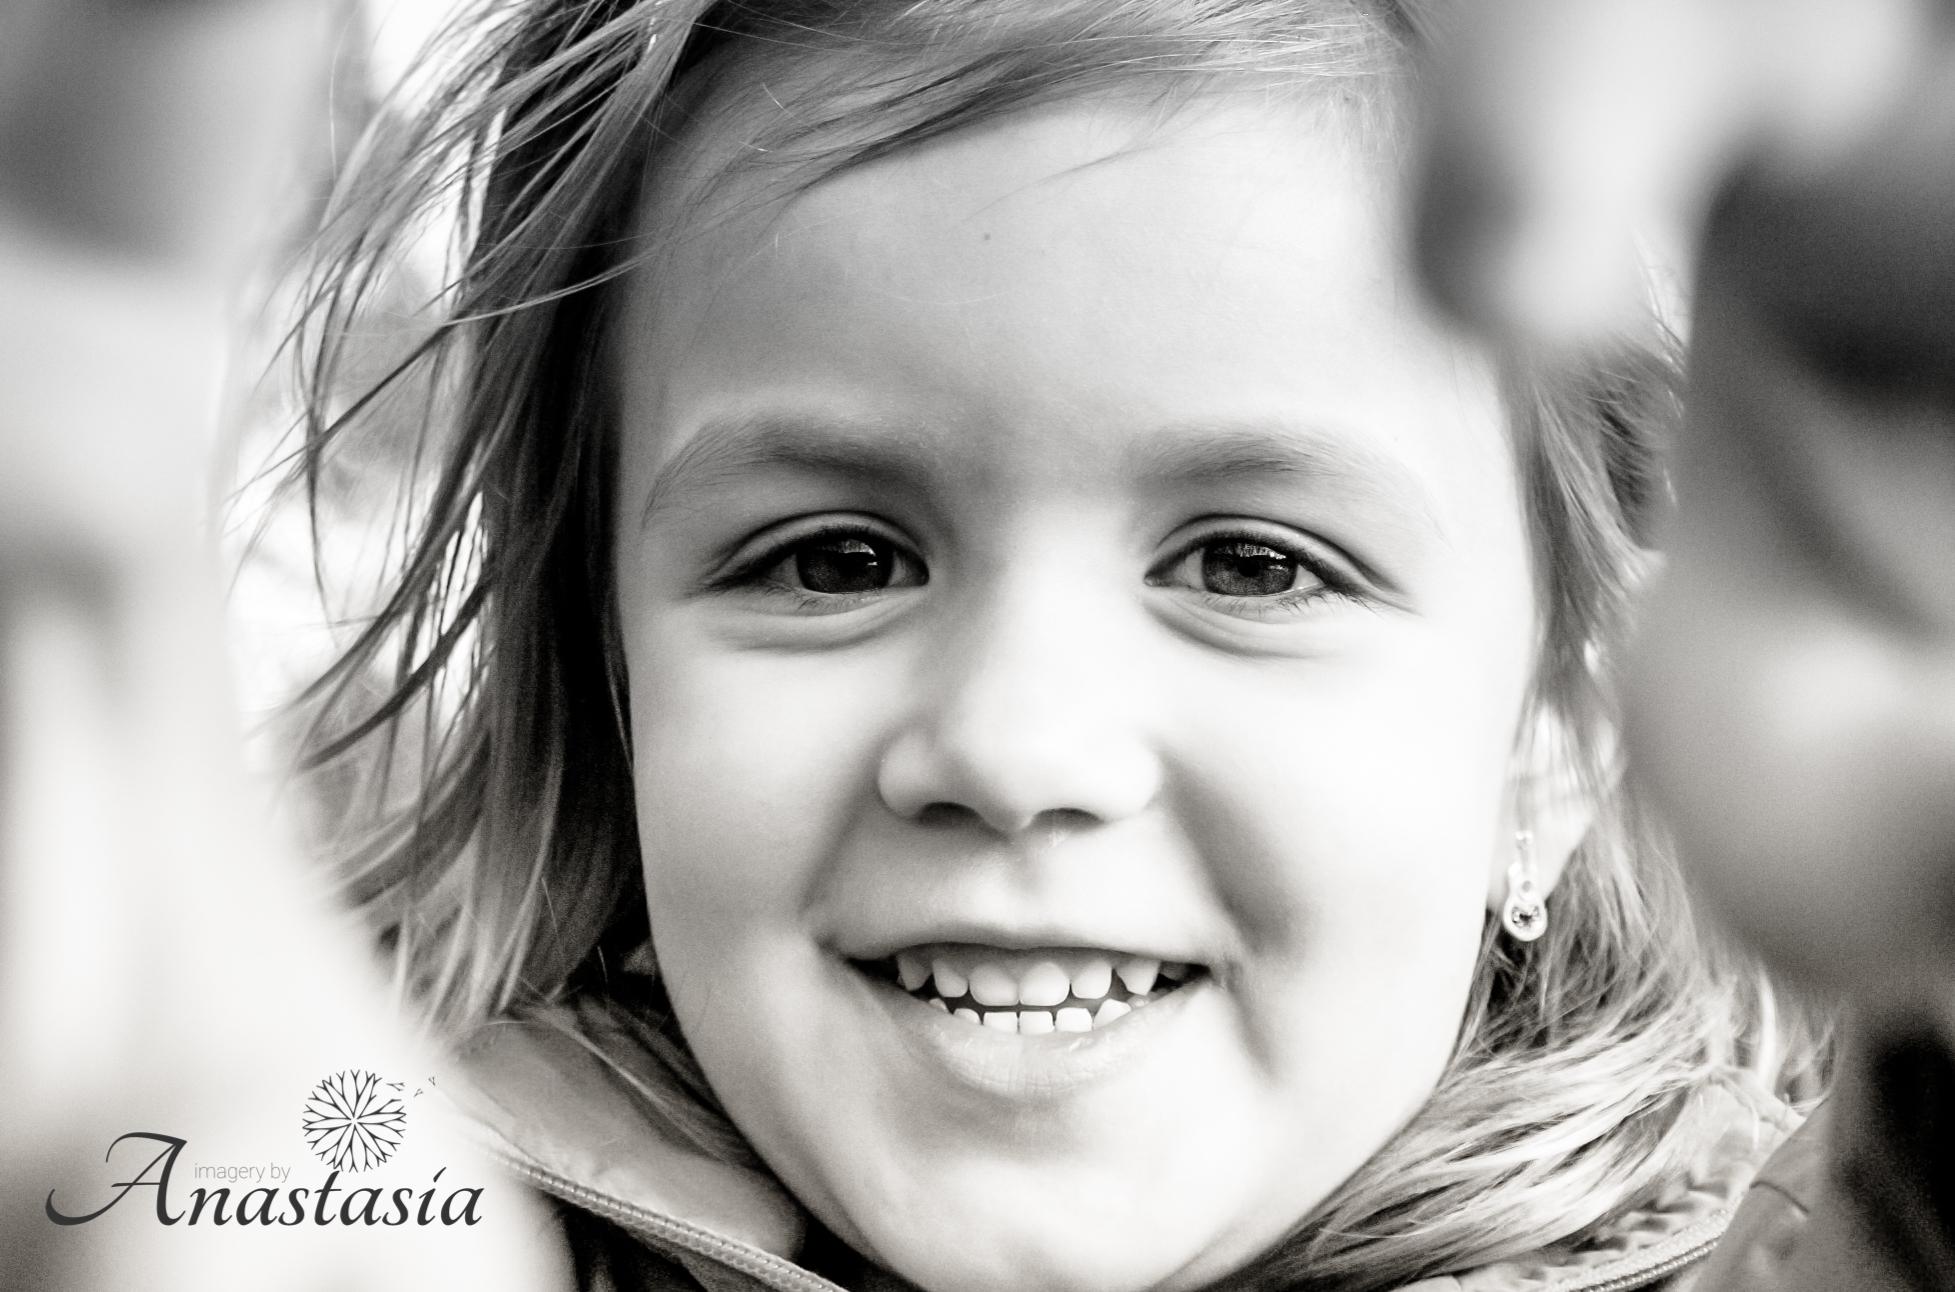 Little girl big smile